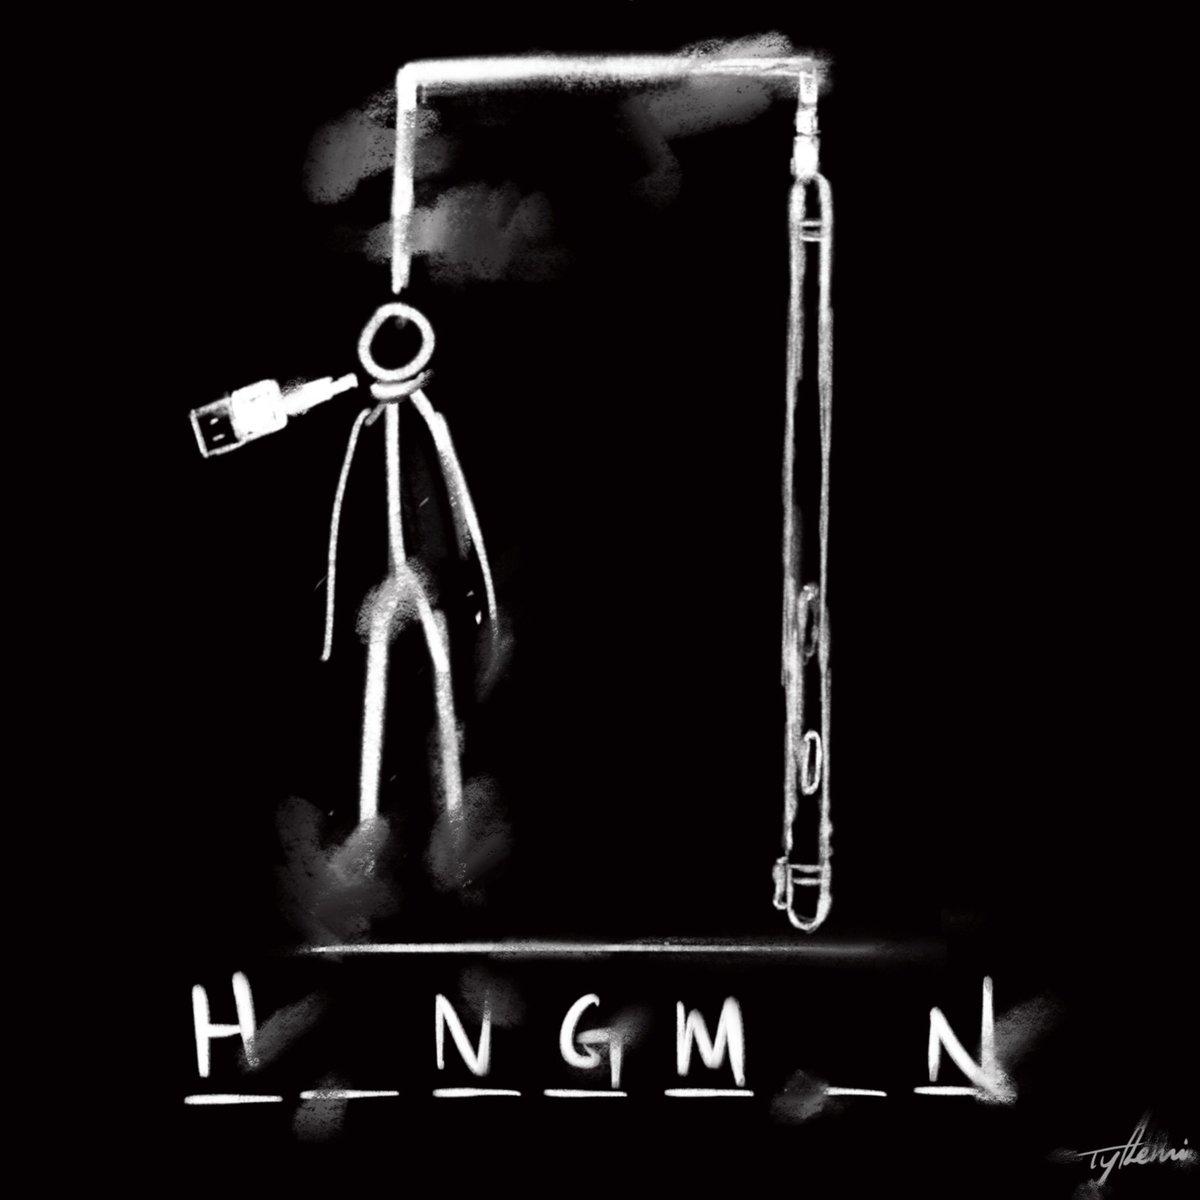 Hangman out tomorrow 8pm....